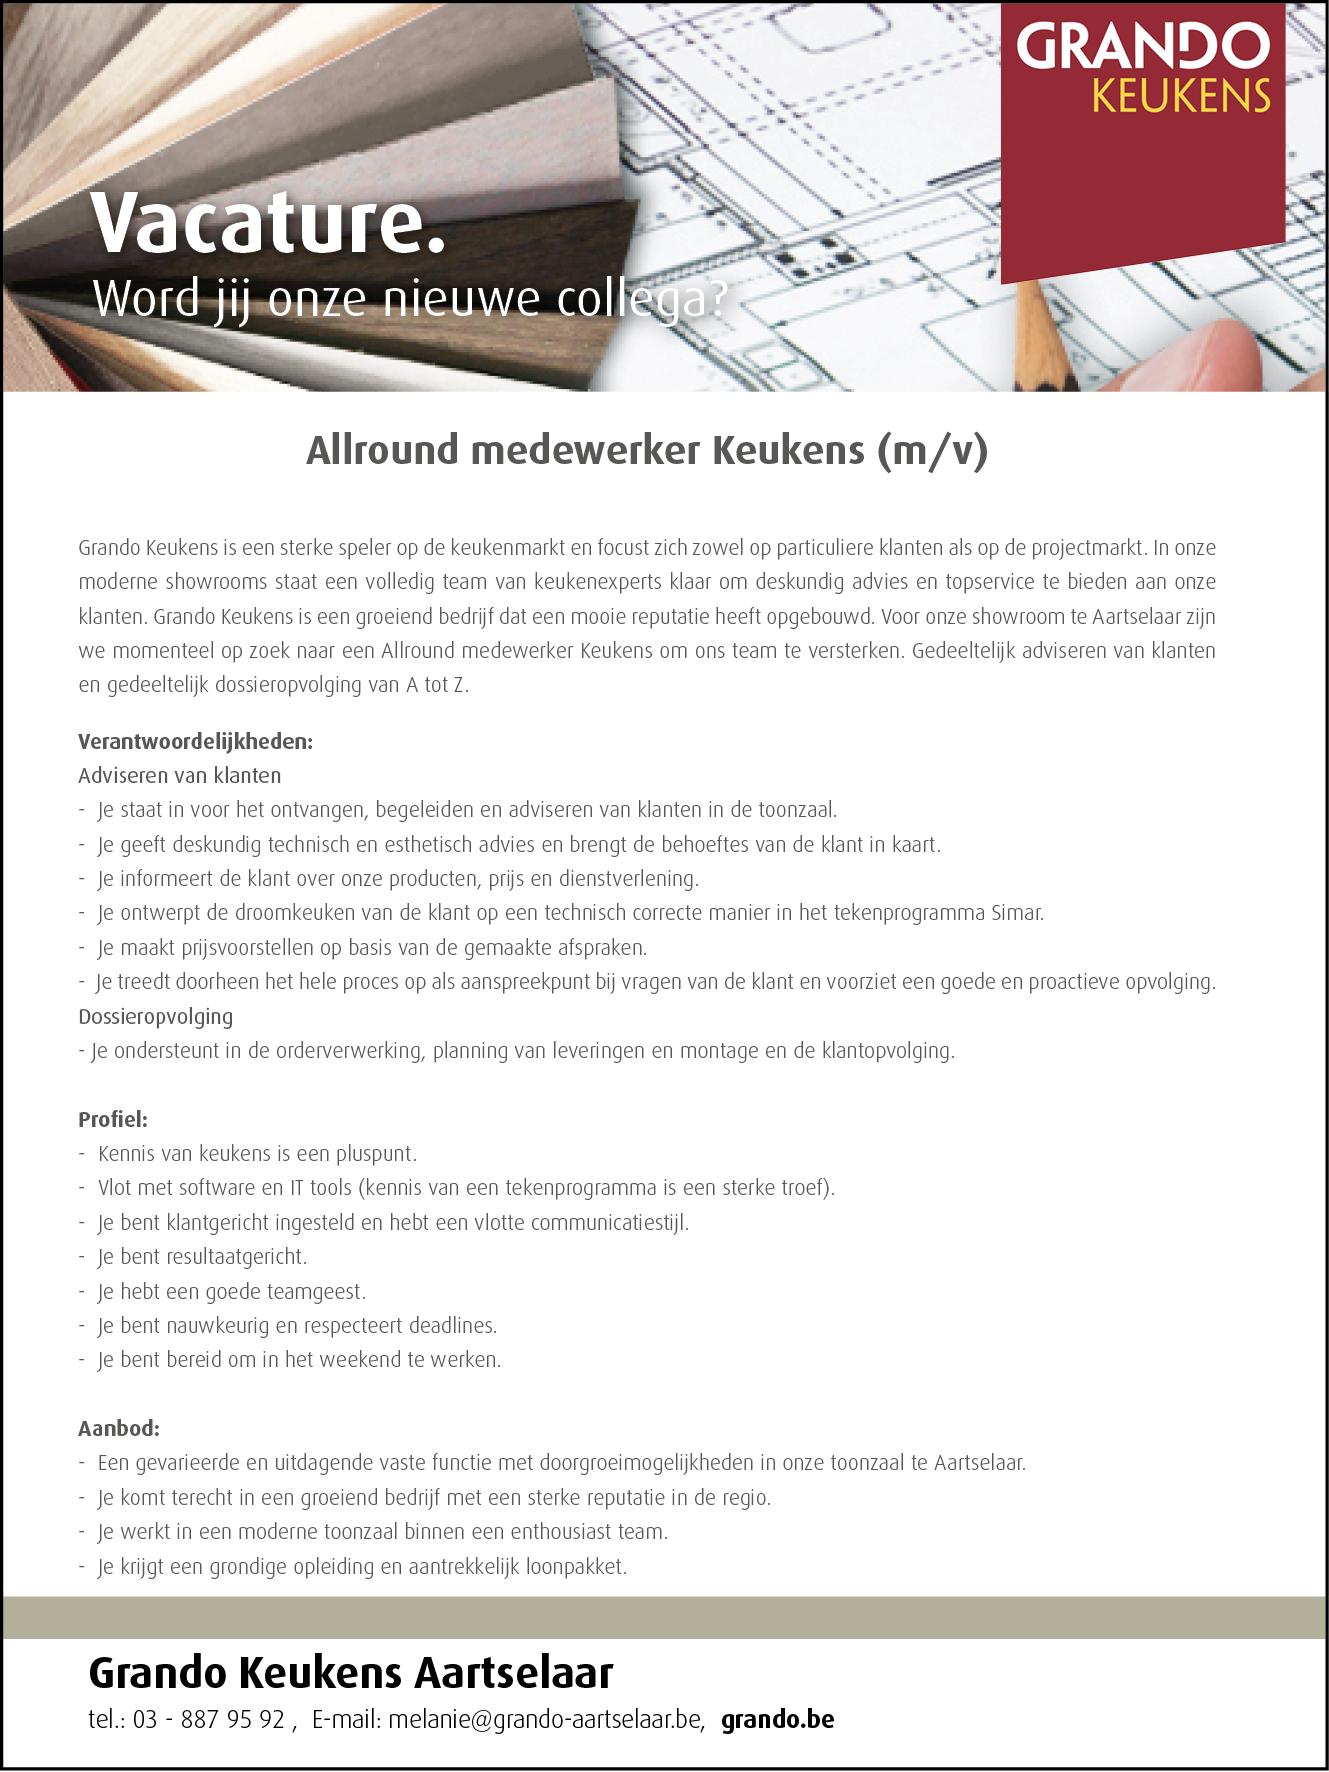 150x200 Vacature Aartselaar Allround medewerker keukens 2021.png